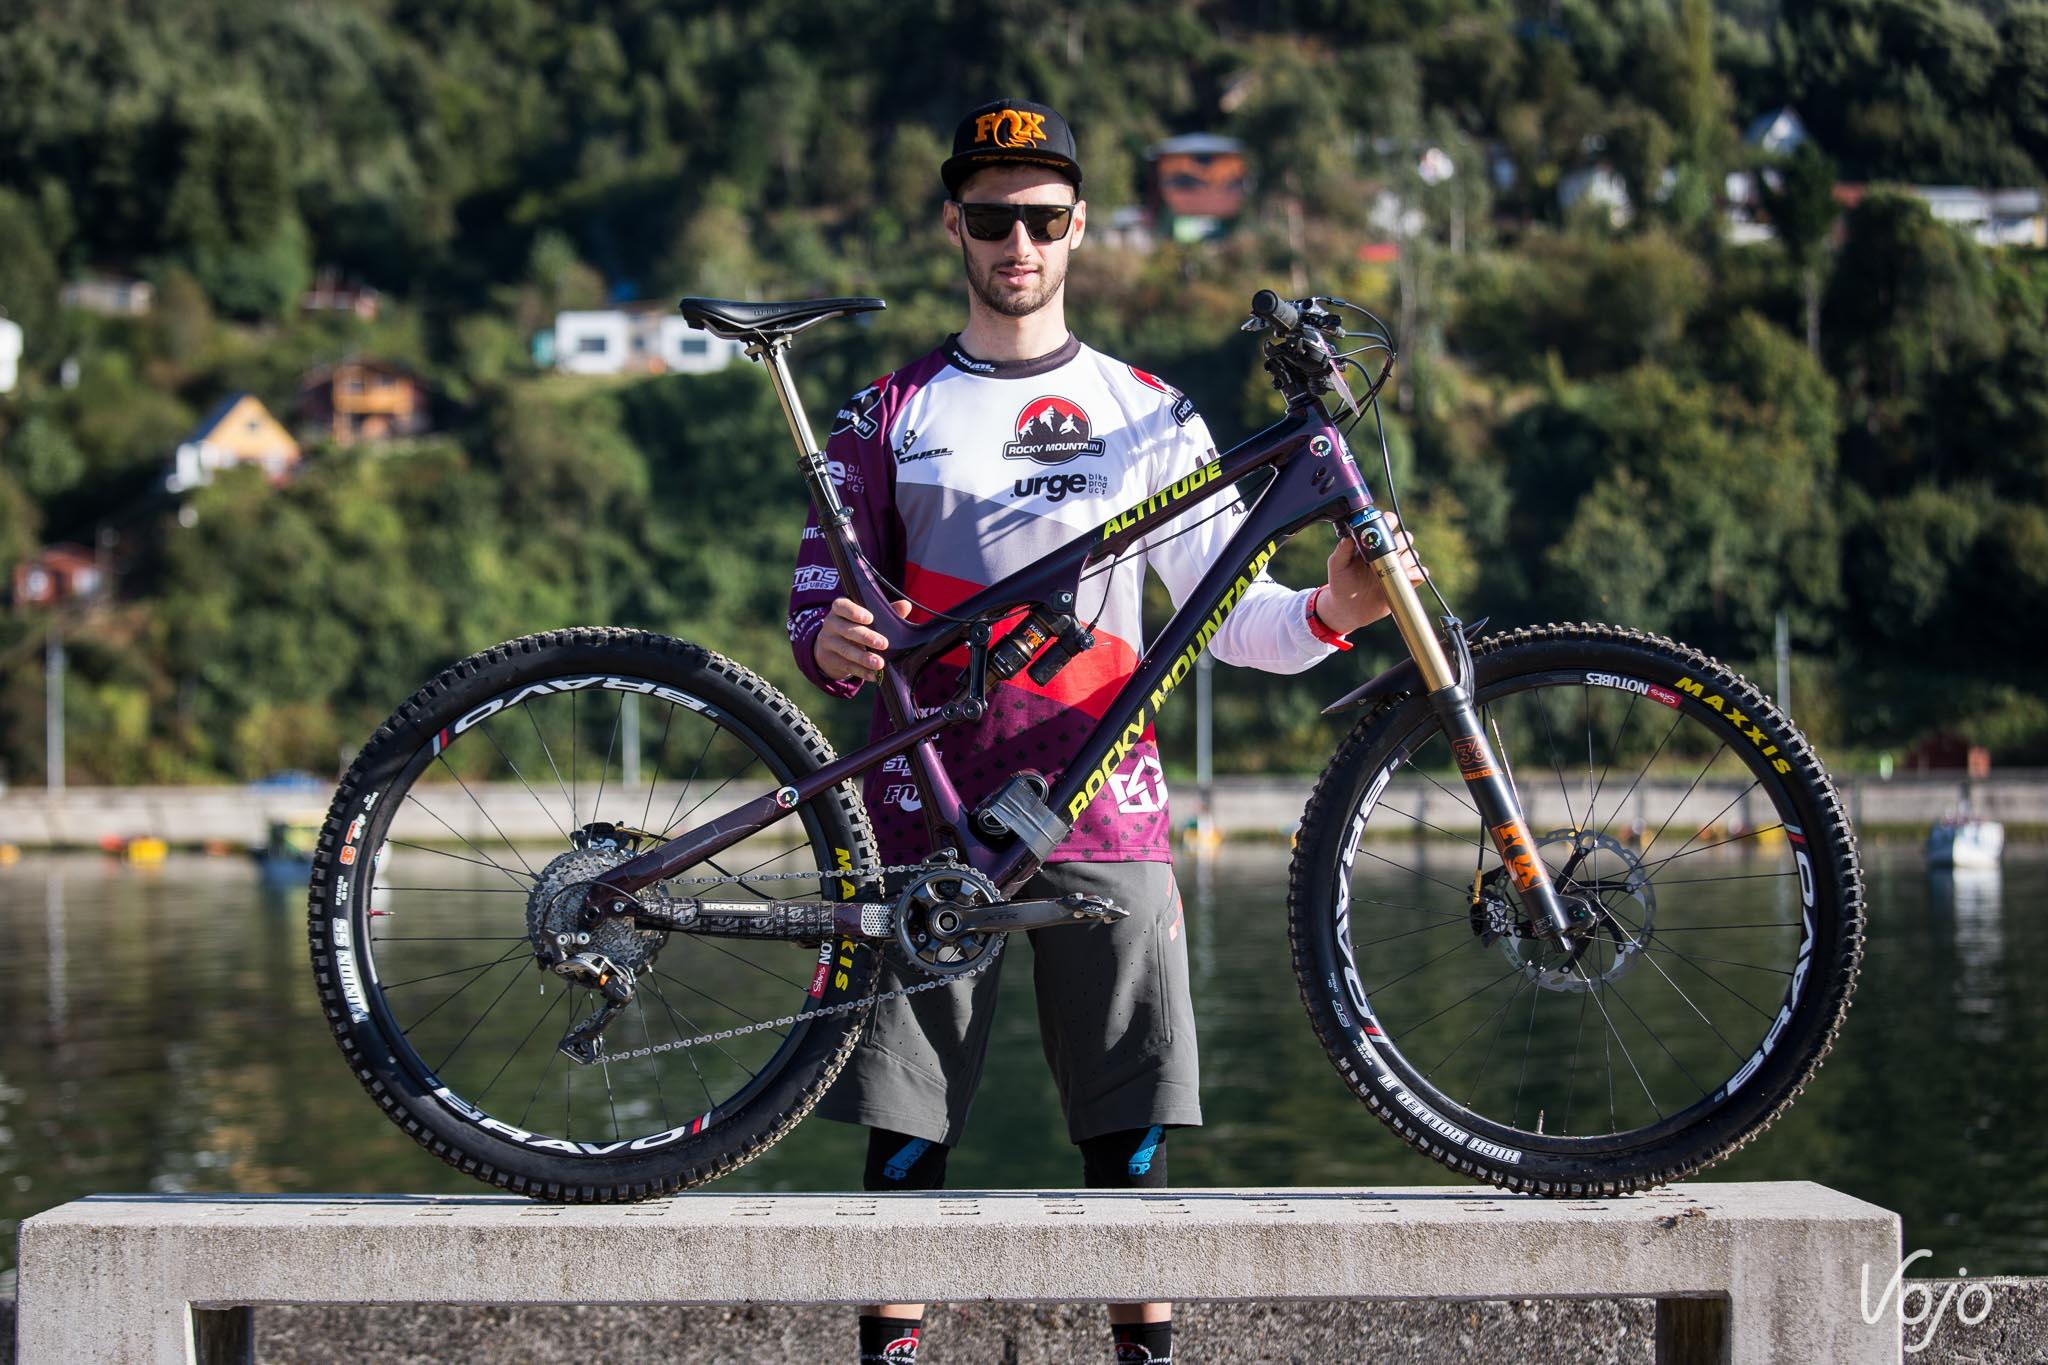 Florian_Nicolai_Rocky_Mountain_Altitude_Bikecheck_Copyright_OBeart_VojoMag-1